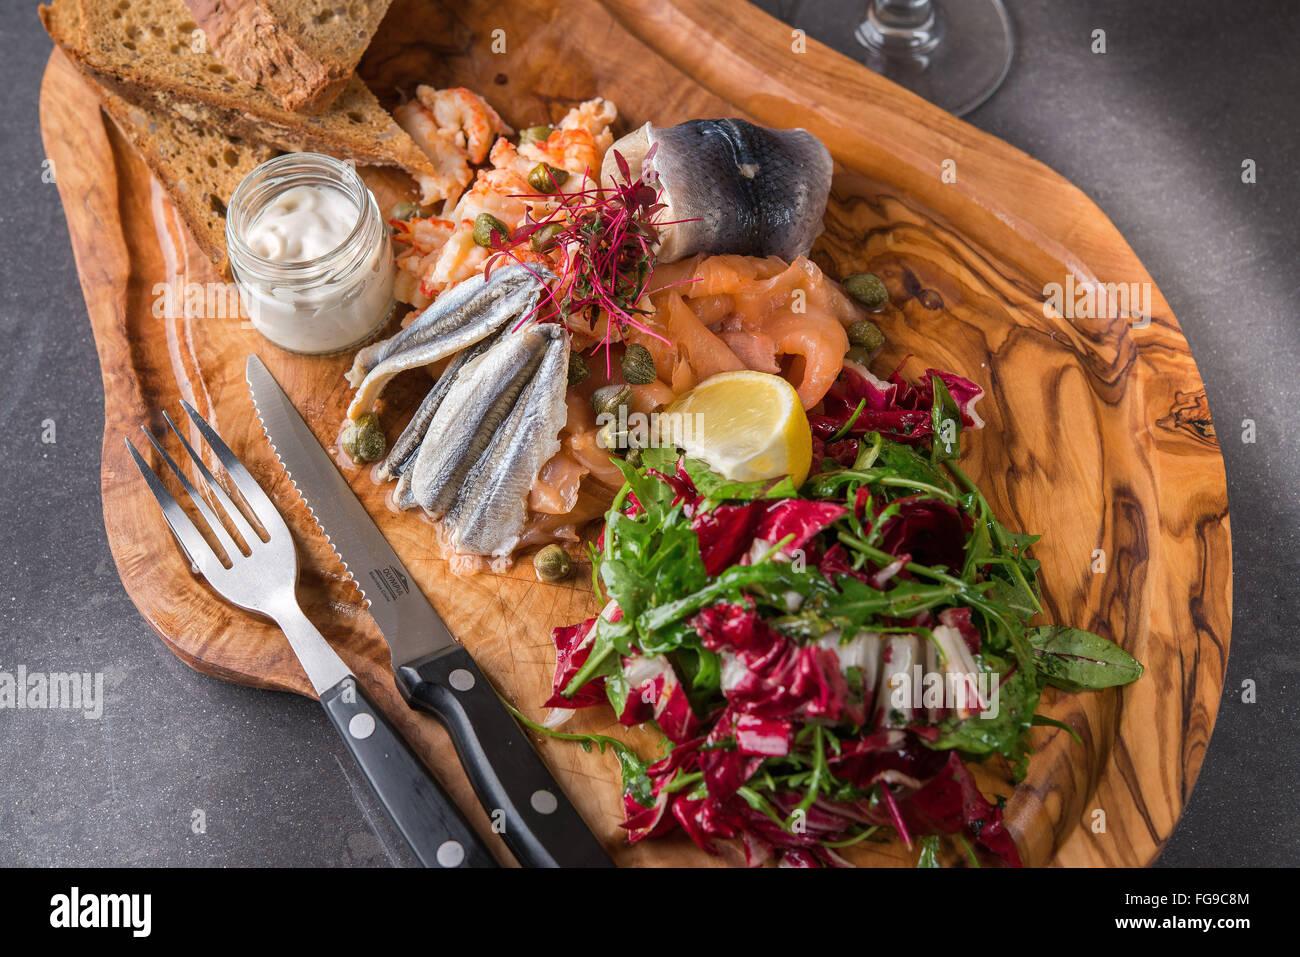 Food Cuisine and Pub Grub - Stock Image